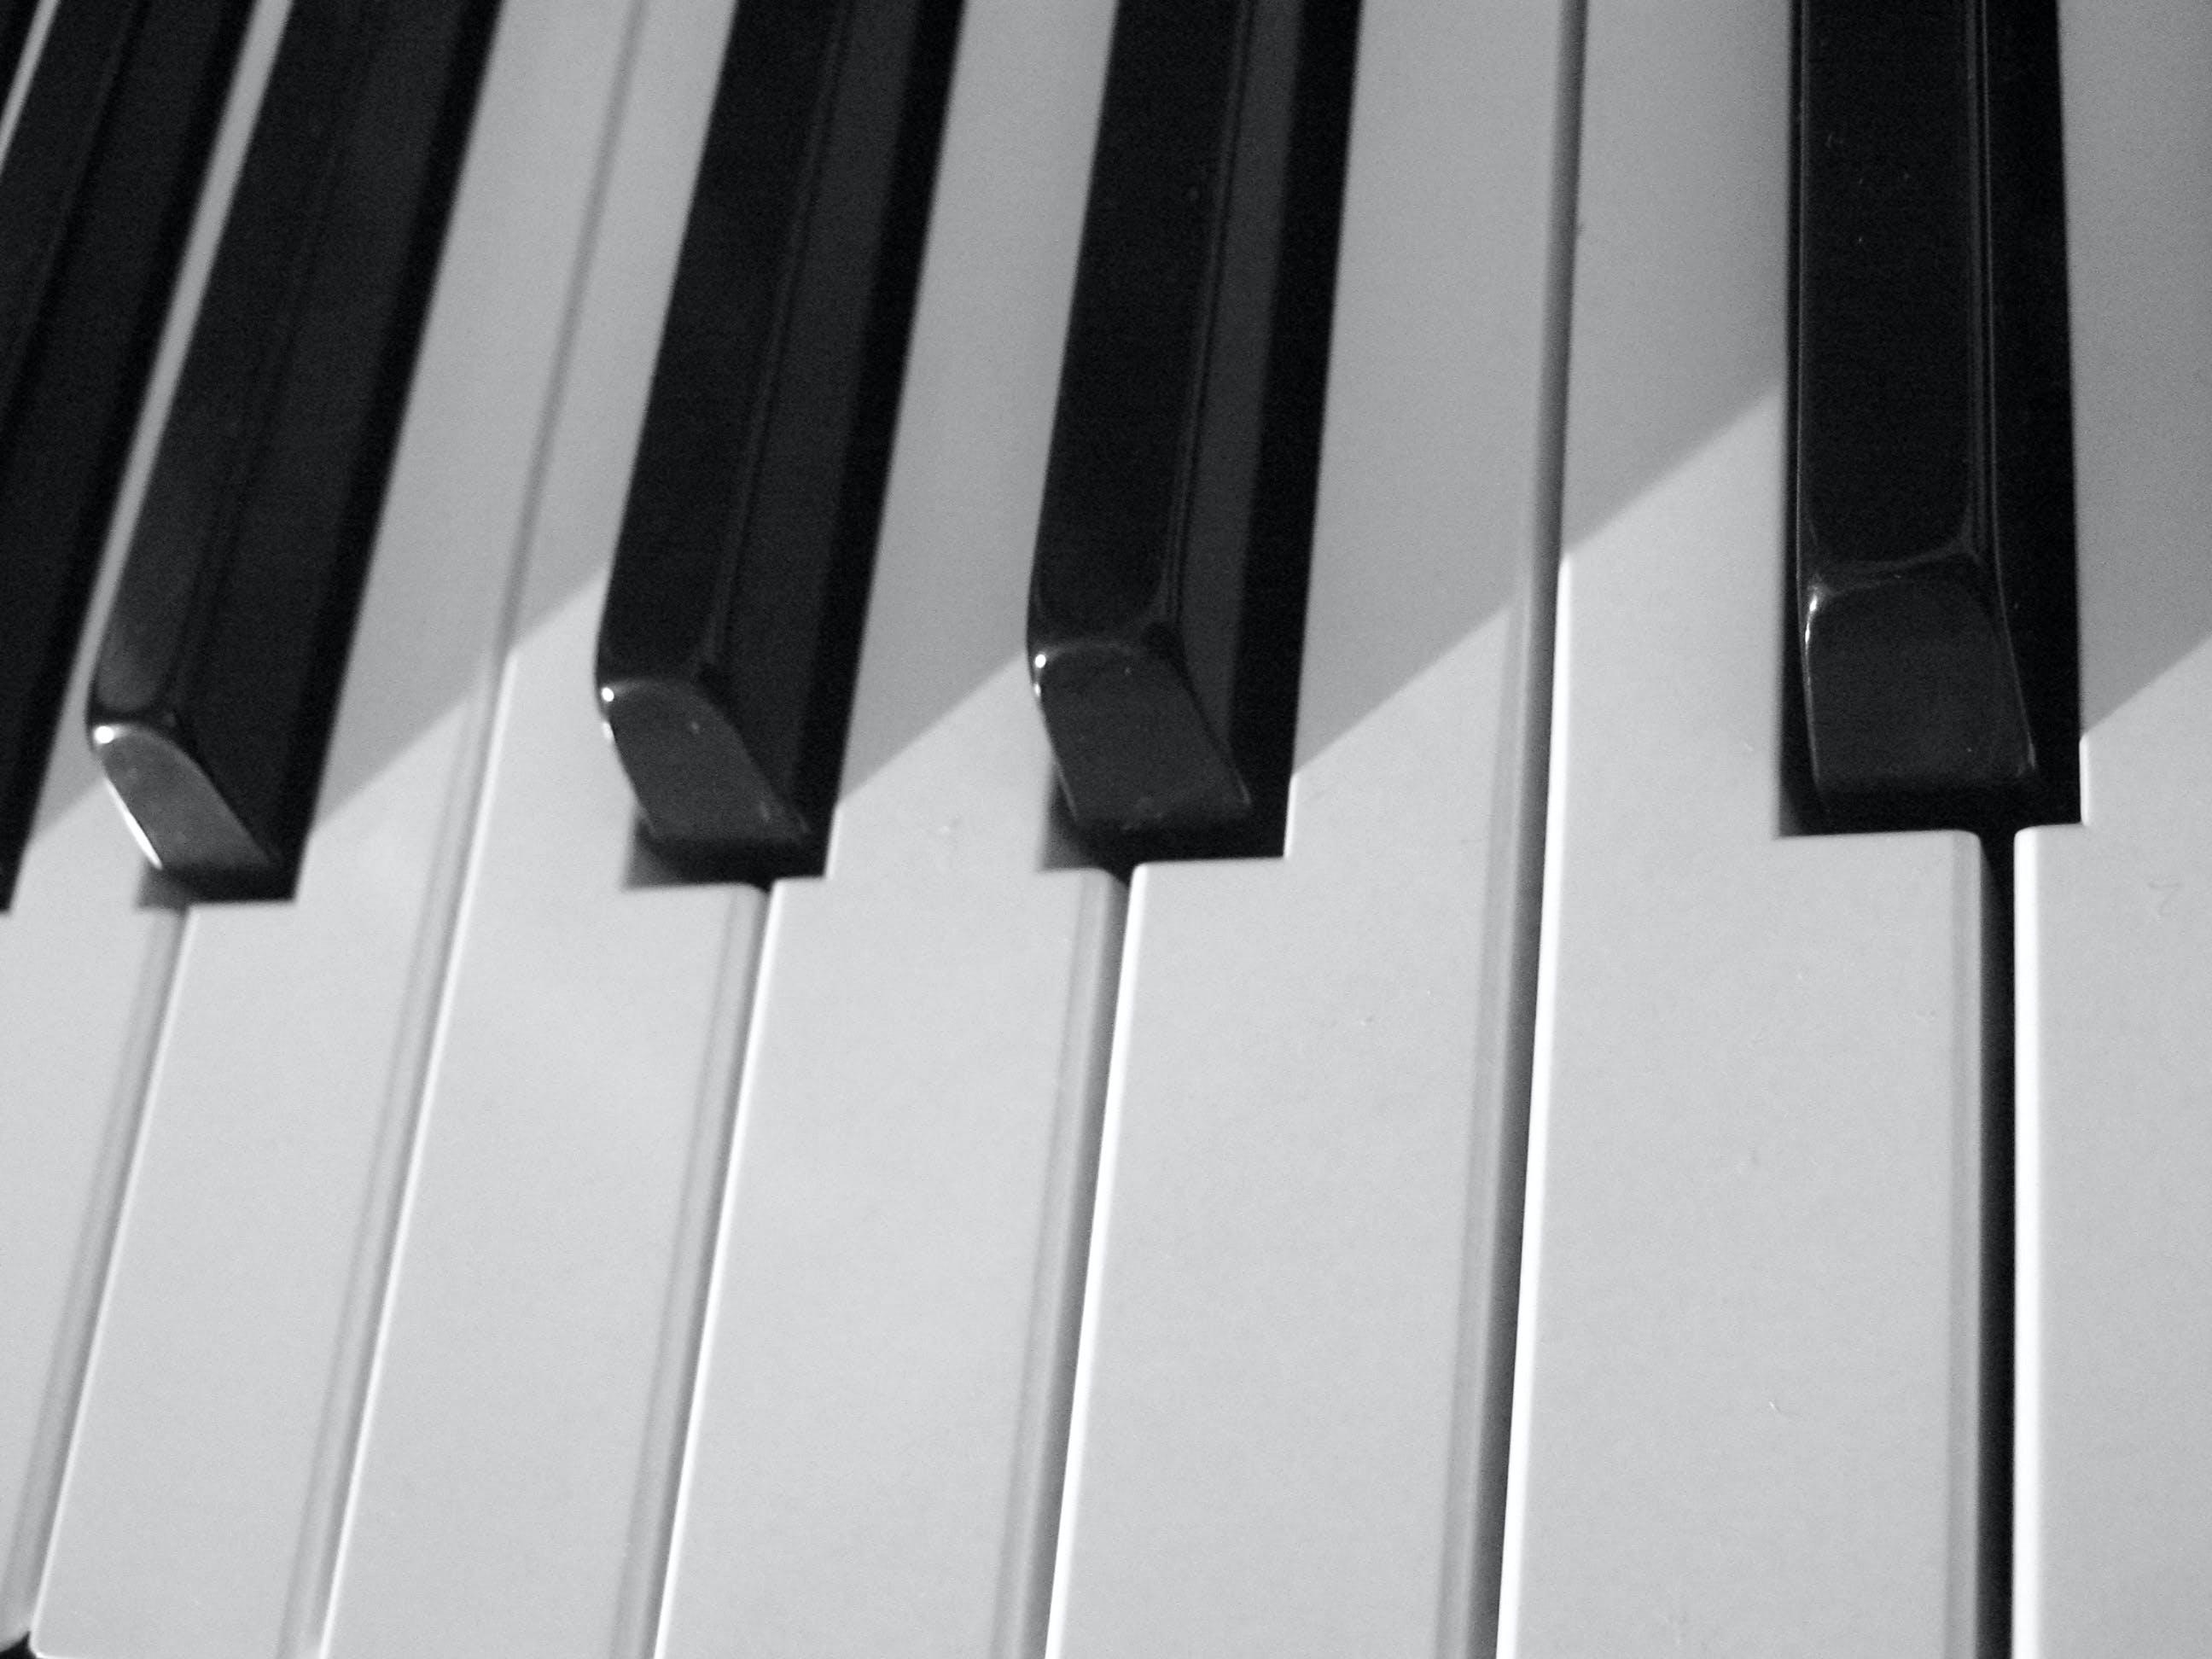 Free stock photo of black and white, keyboard, keys, music